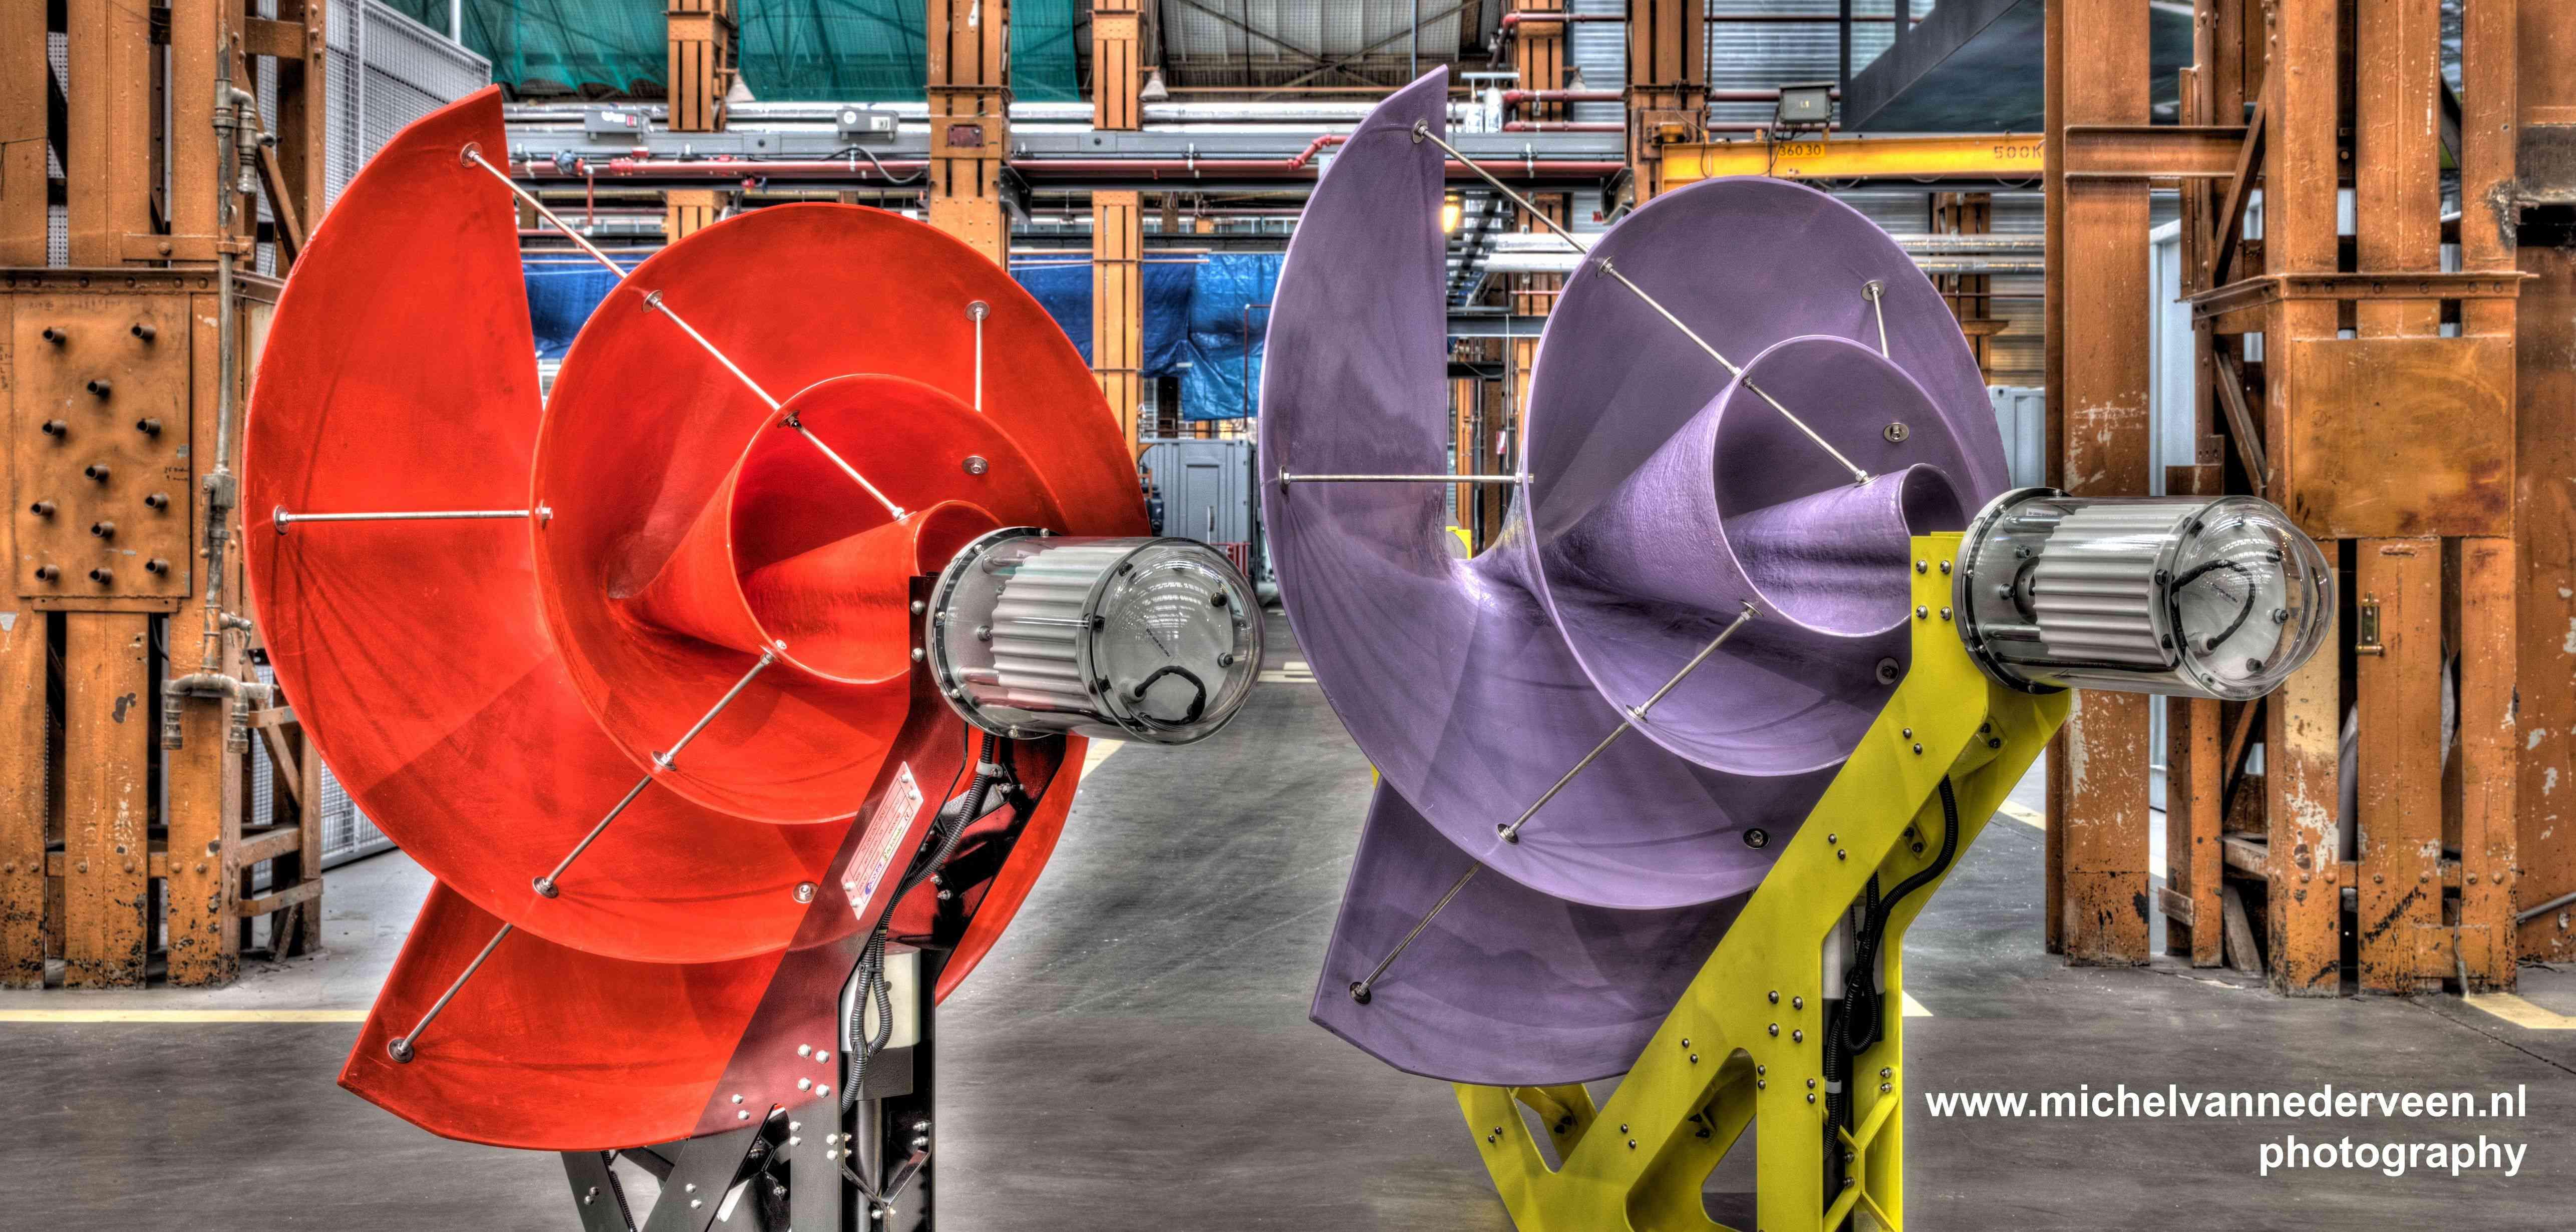 nautilus-shaped silent rooftop wind turbine